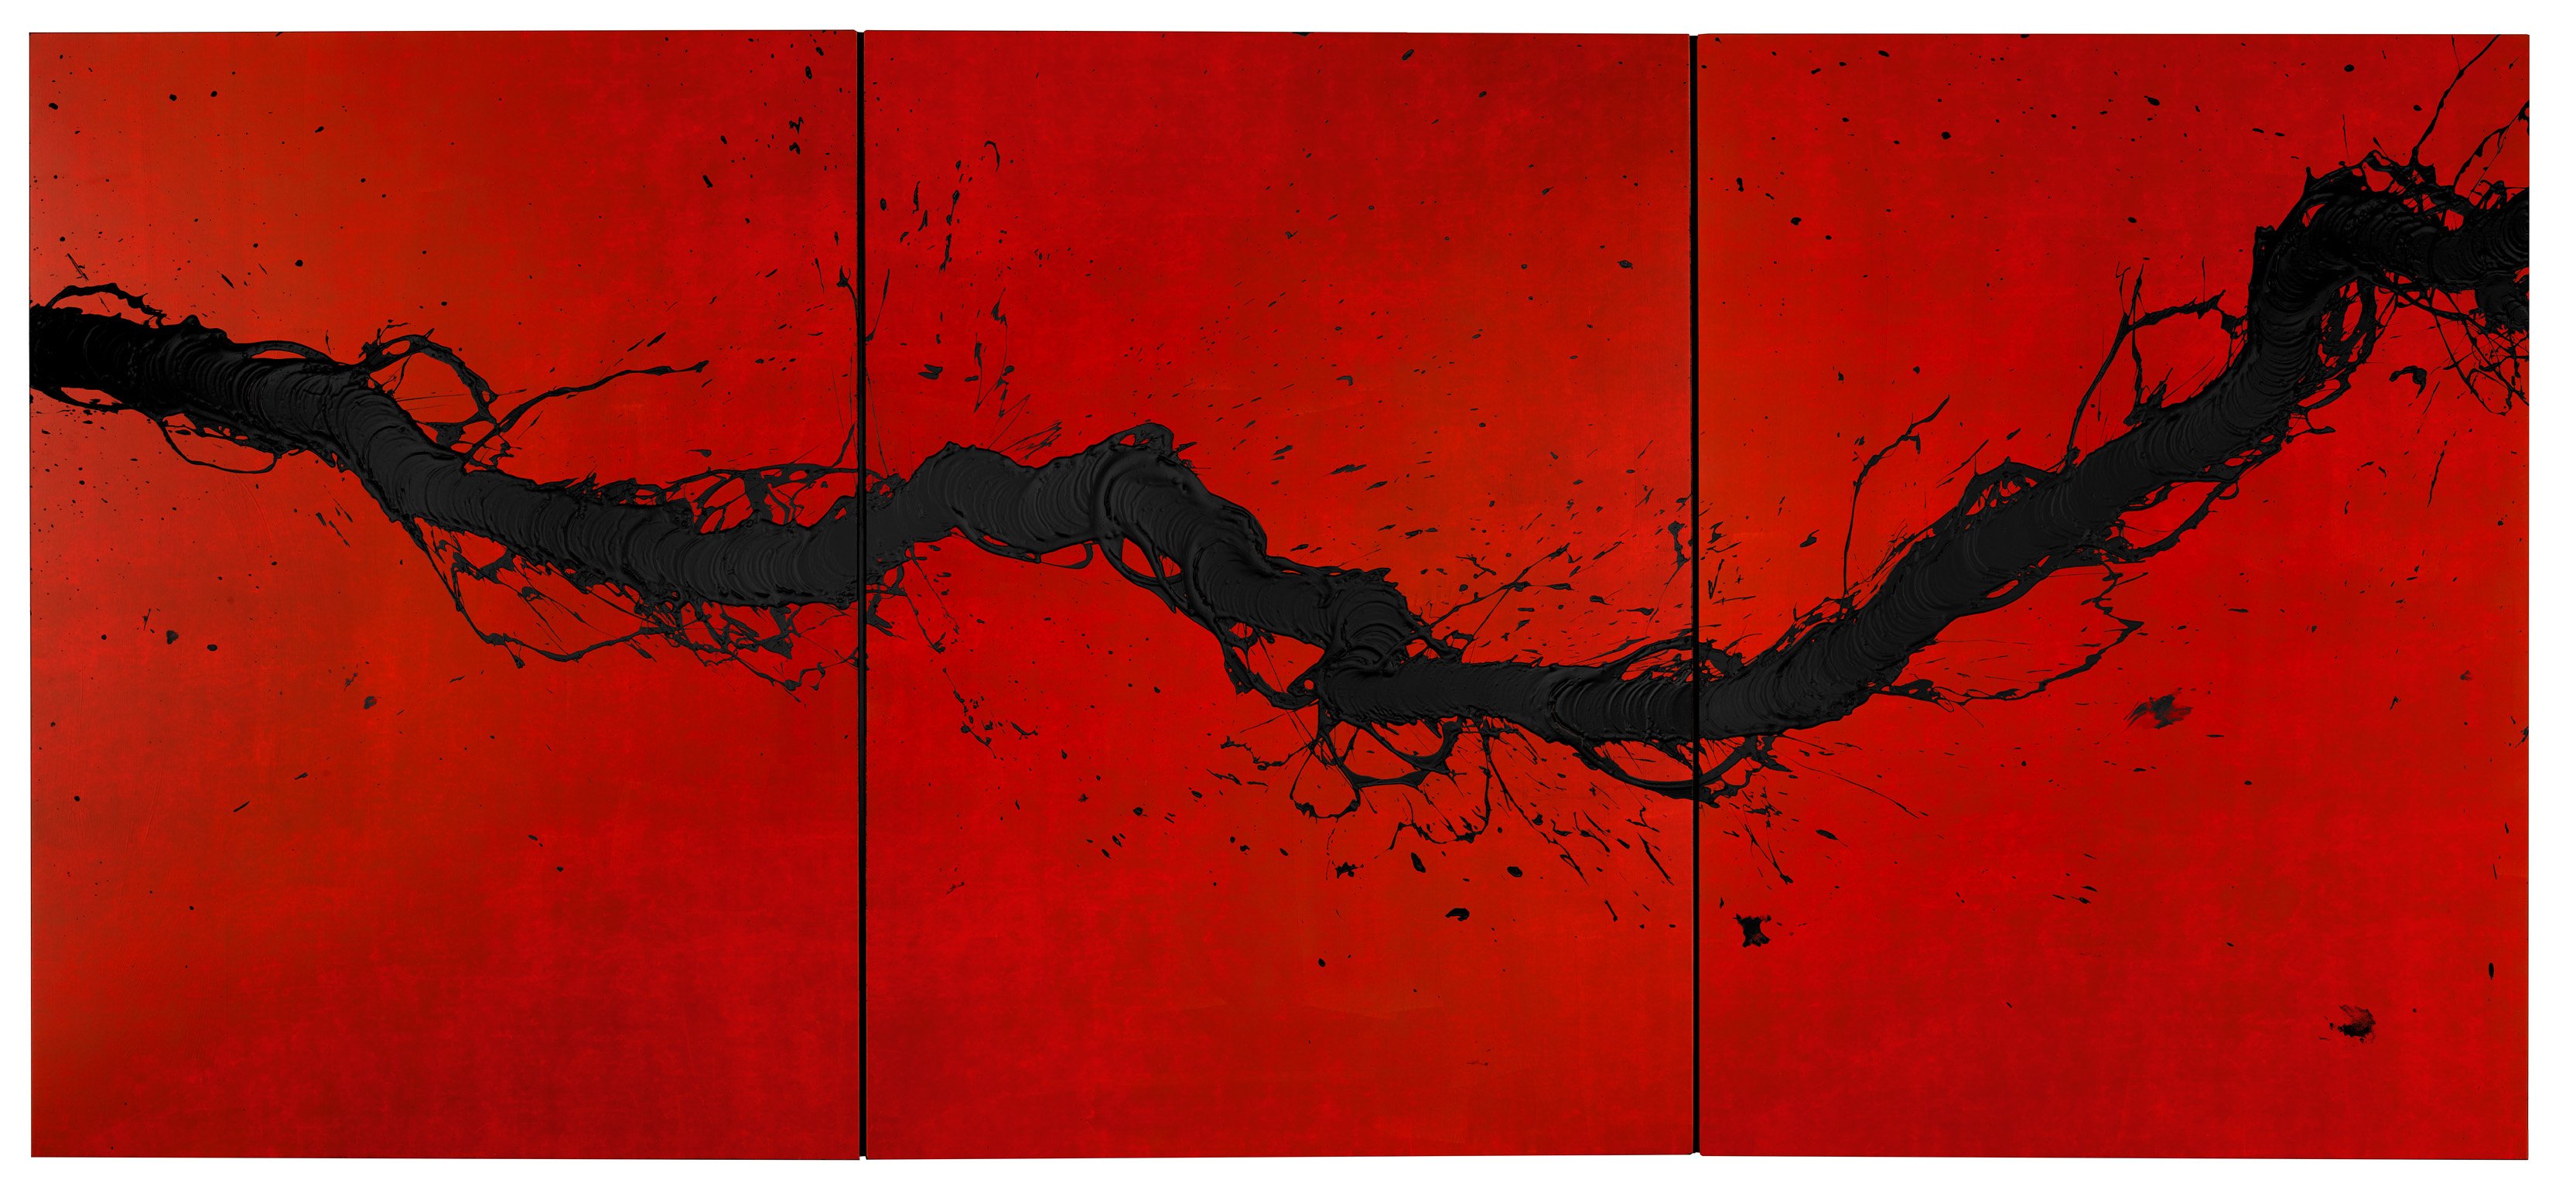 fabienne-verdier-mutation-2016-acrylic-and-mixed-media-on-canvas-183-x-407-cm-courtesy-waddington-custot